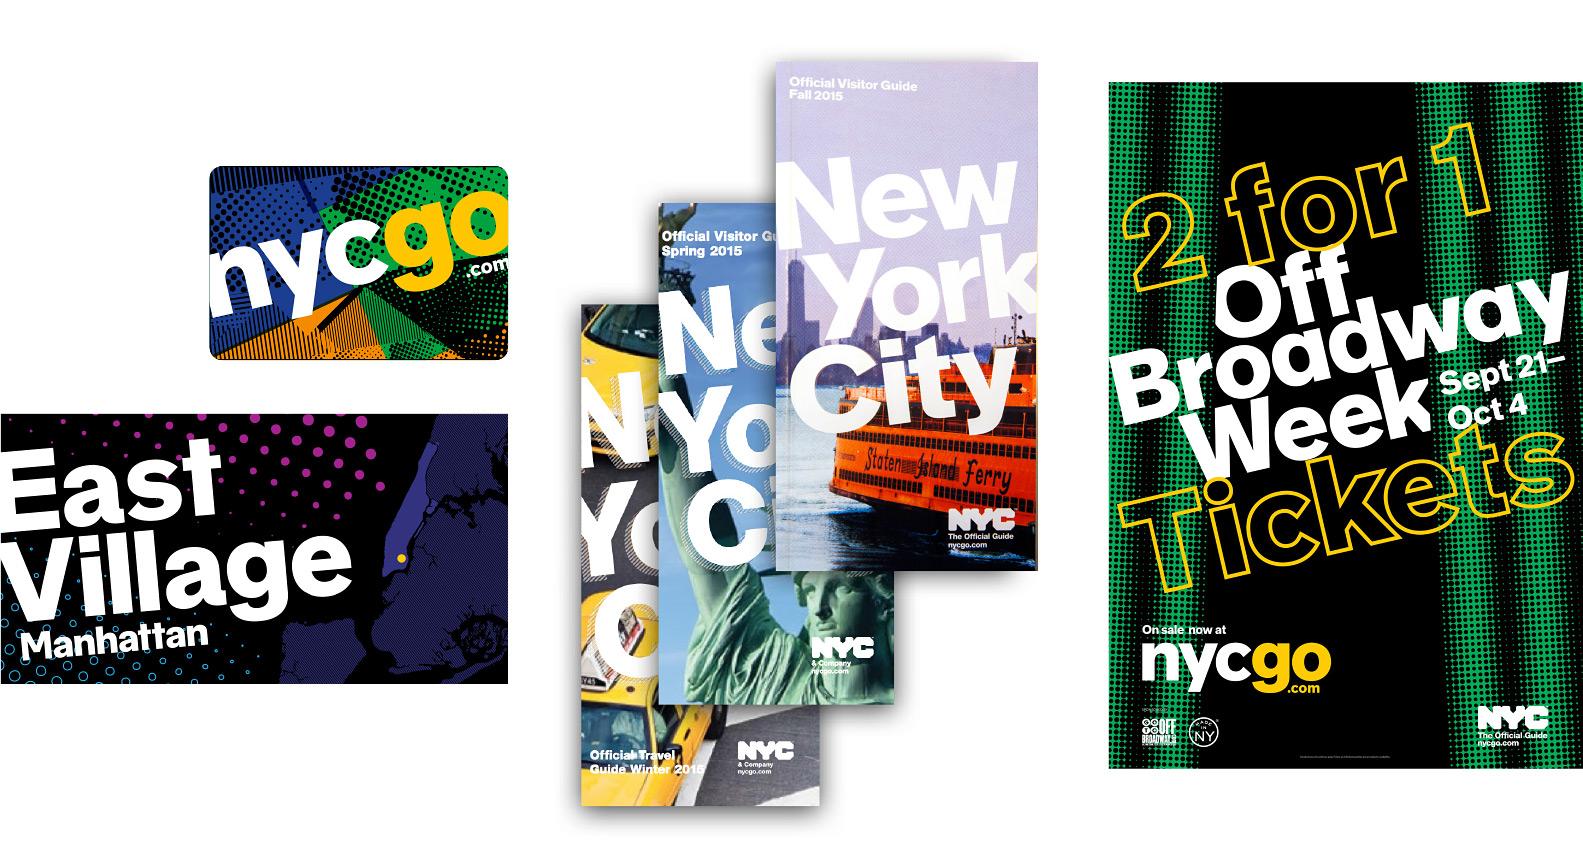 emily-lessard-nycgo-brand-official-visual-guide.jpg